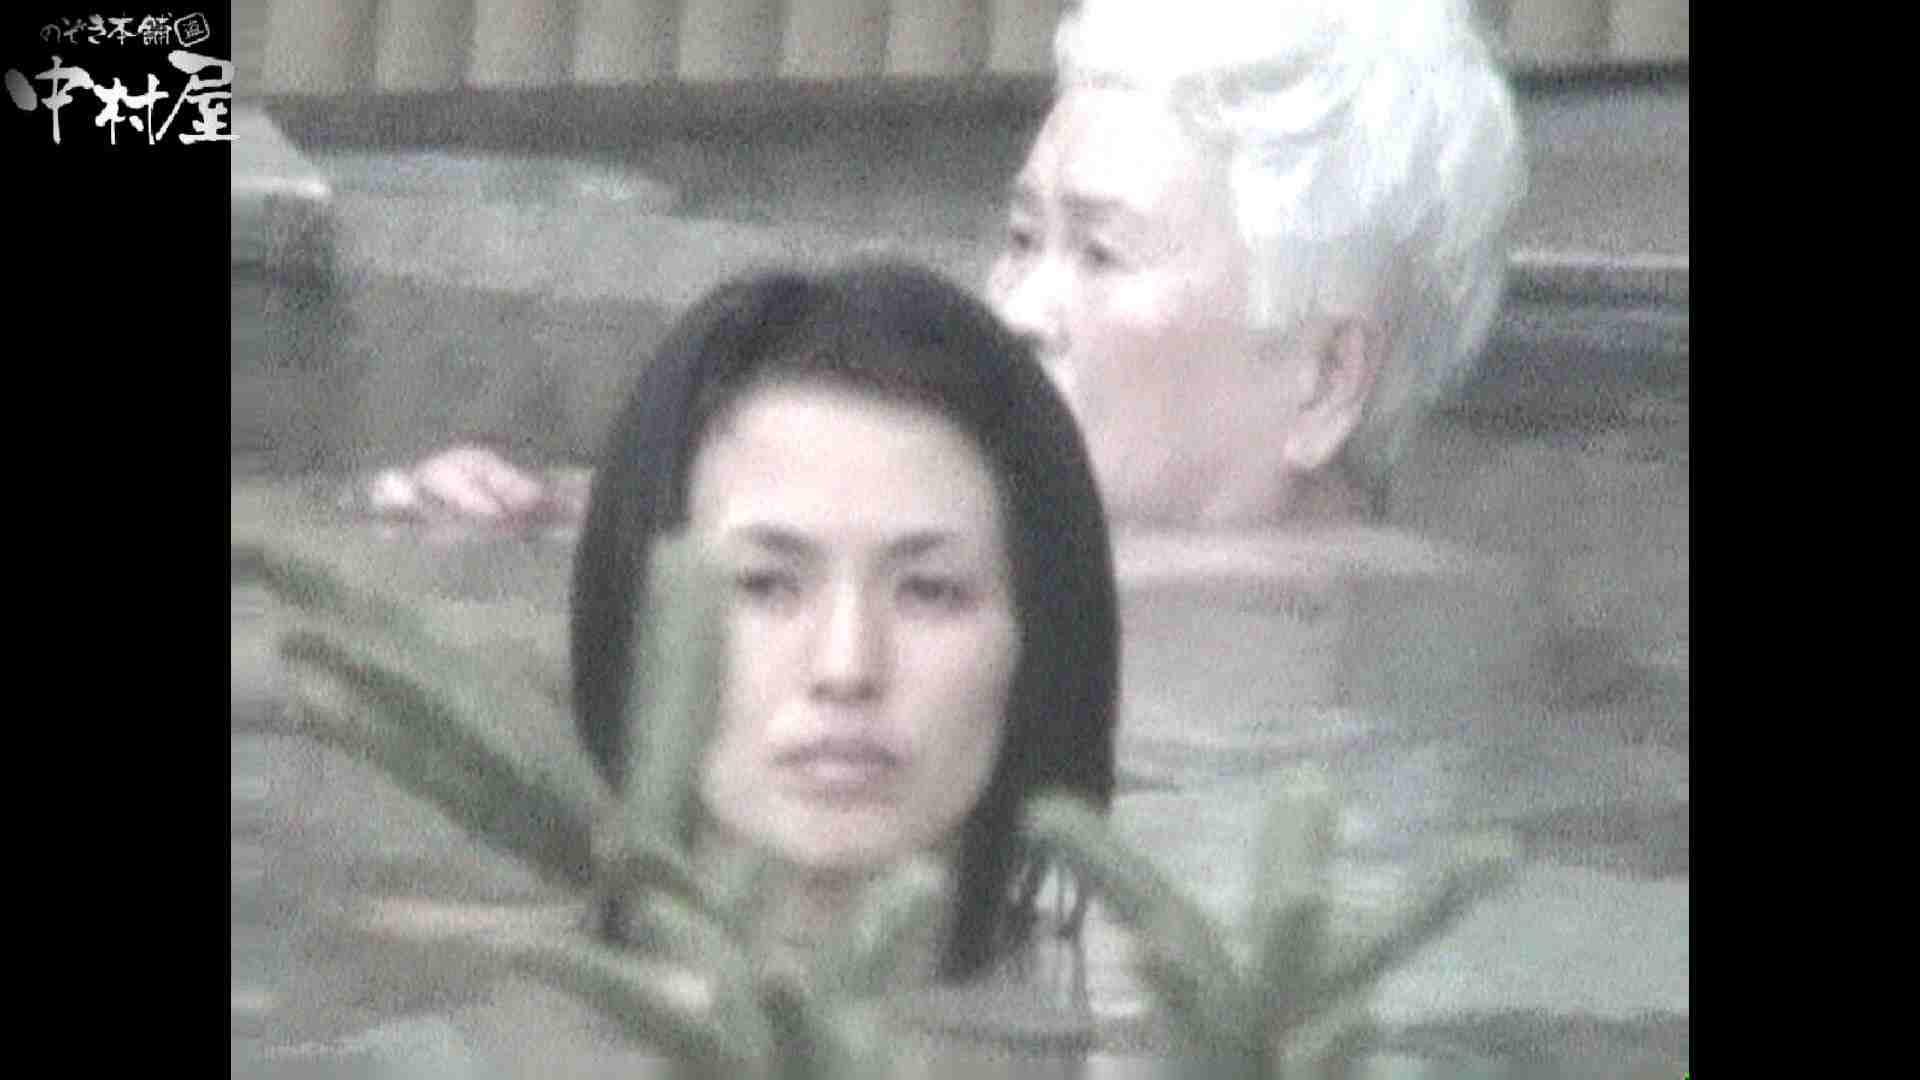 Aquaな露天風呂Vol.933 盗撮 おまんこ動画流出 78PICs 50